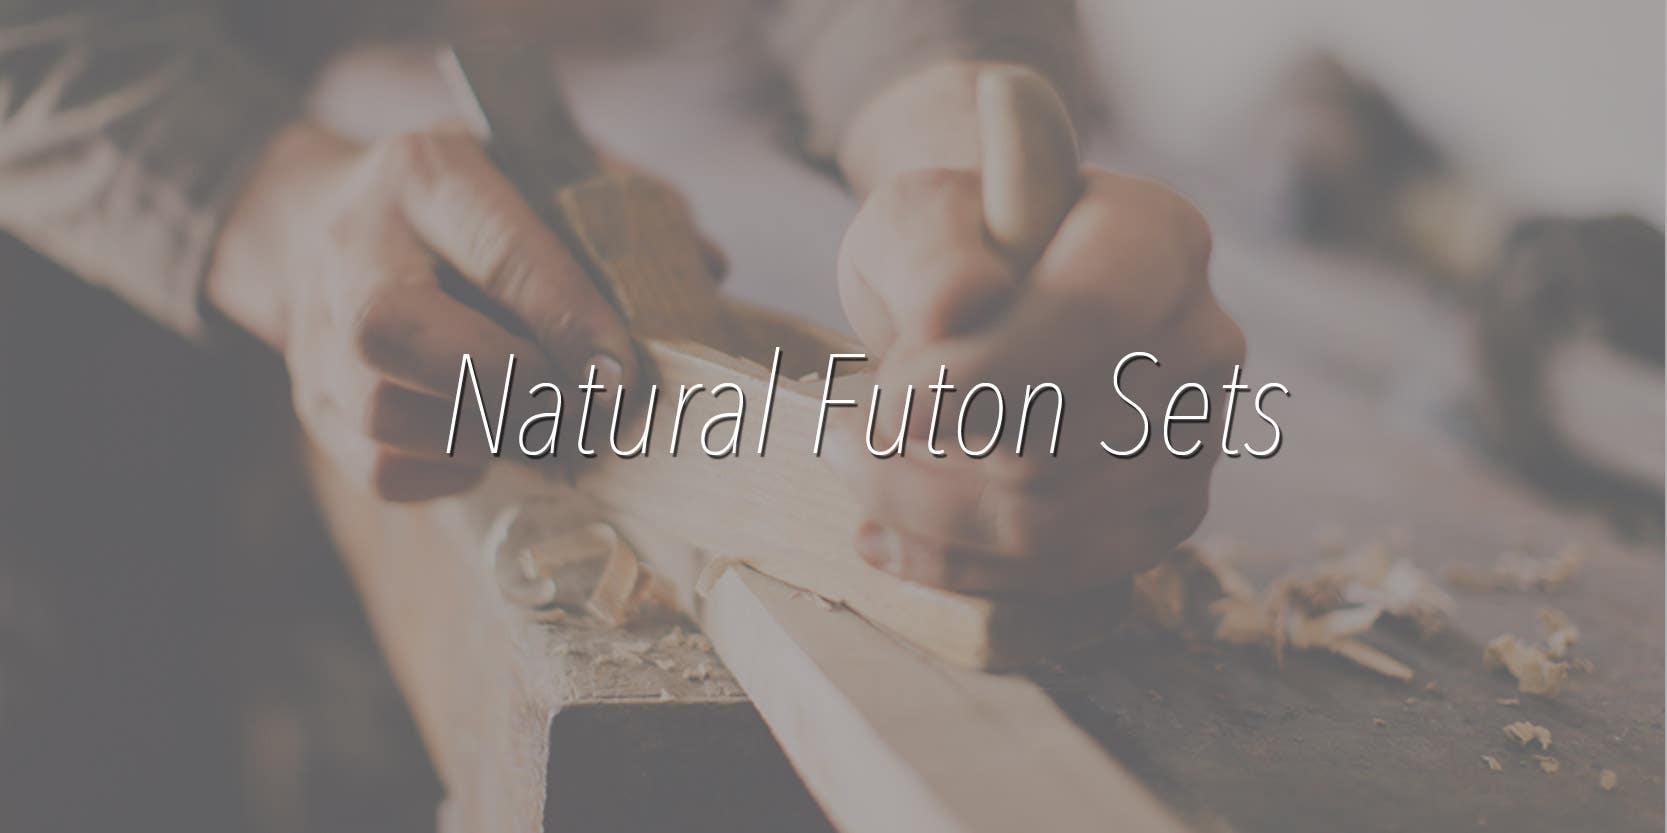 Natural Futon Sets